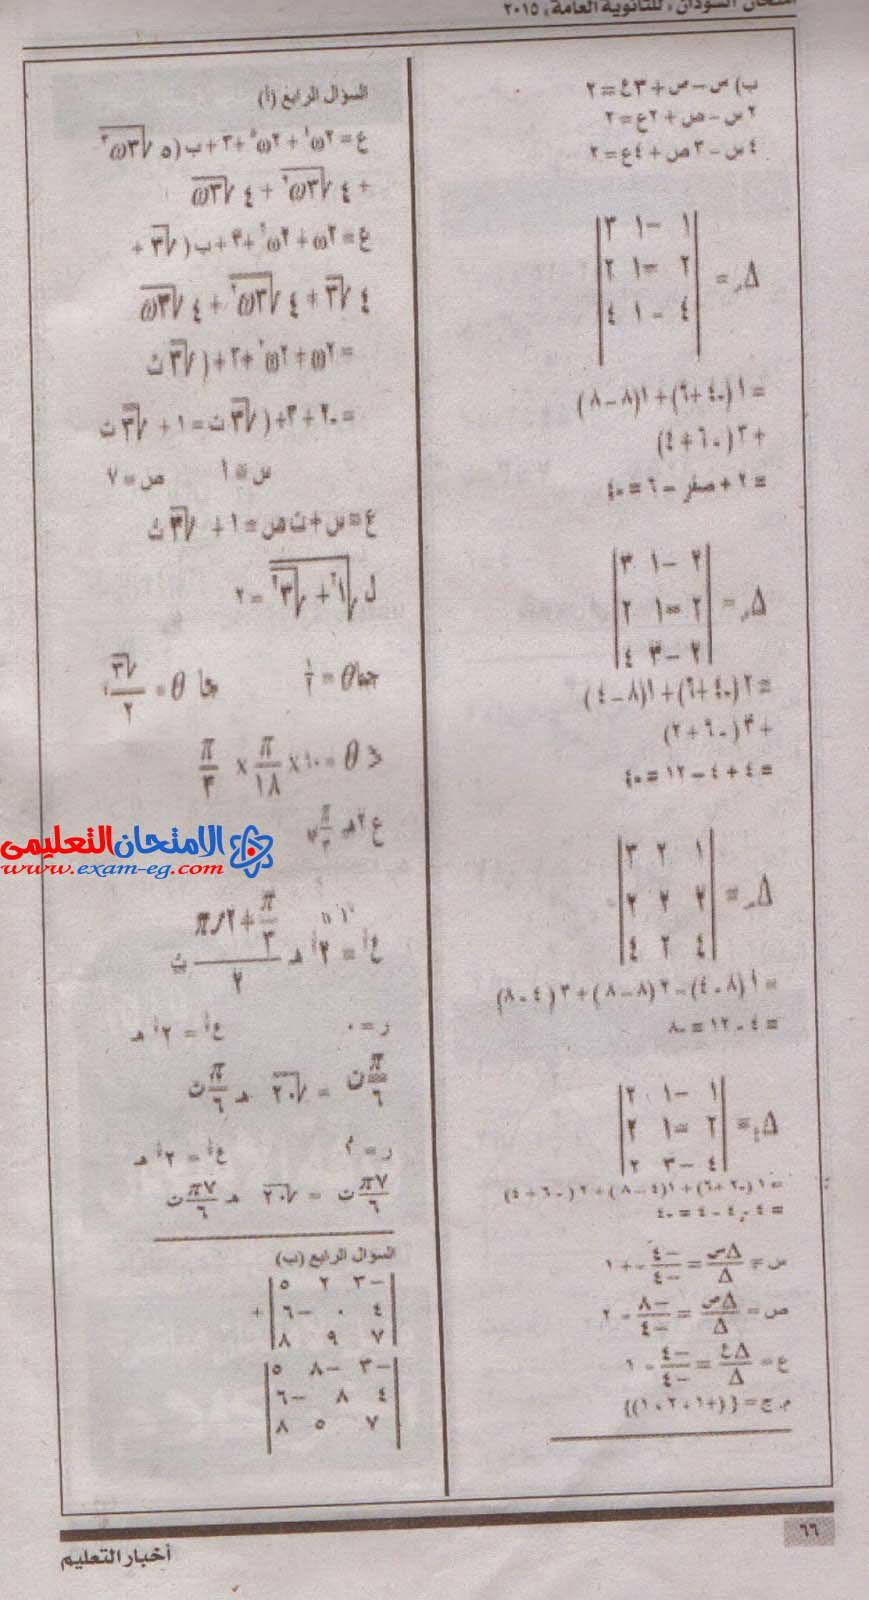 exam-eg.com_1429846664492.jpg